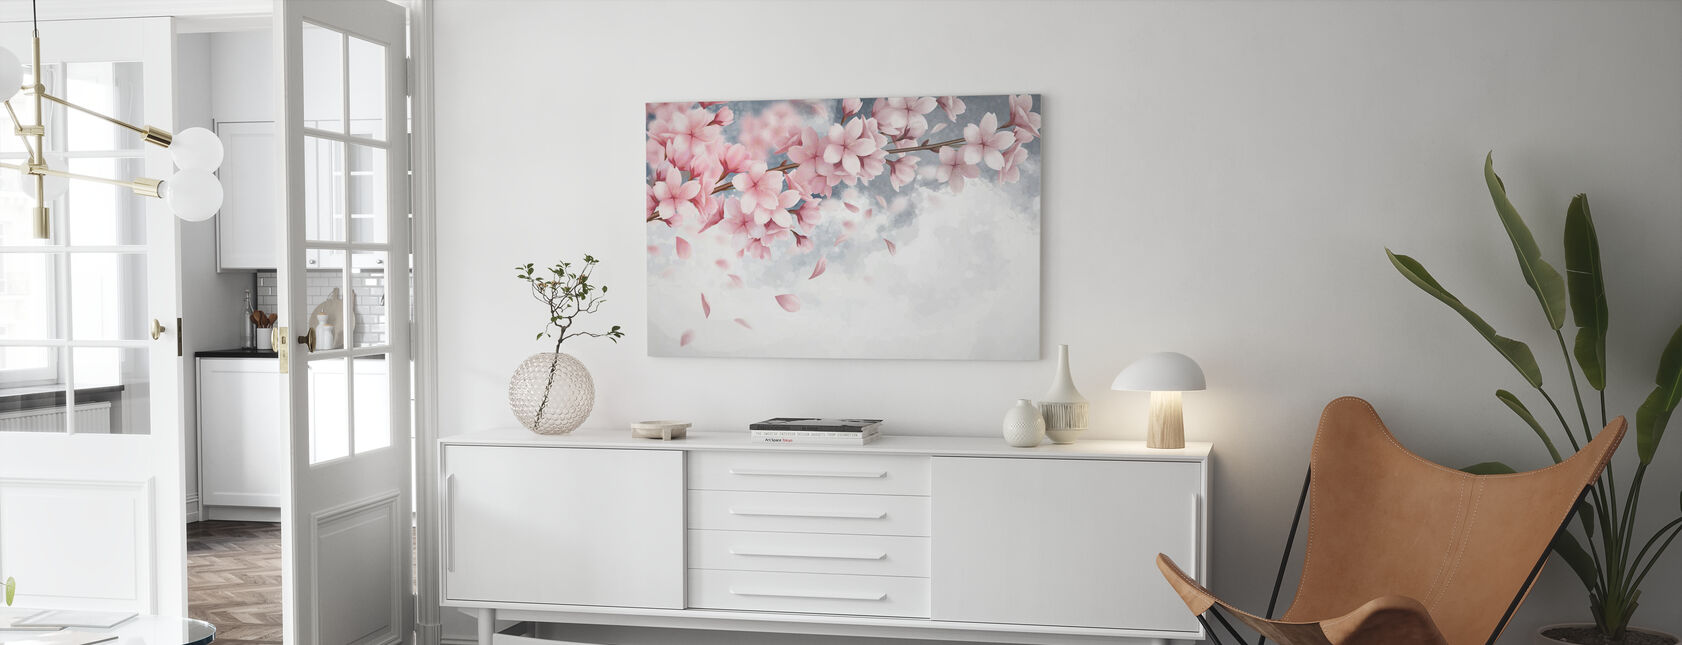 Sakura Blüte - Leinwandbild - Wohnzimmer